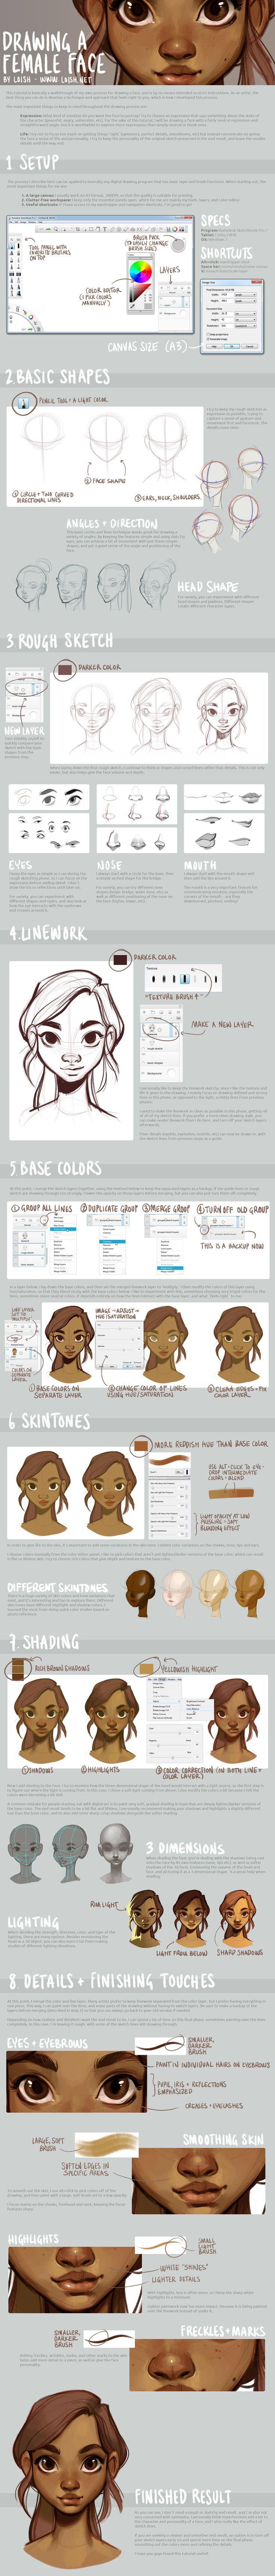 #Tutorial - Drawing a Female Face by http://loish.deviantart.com on @DeviantArt #Art #Drawing